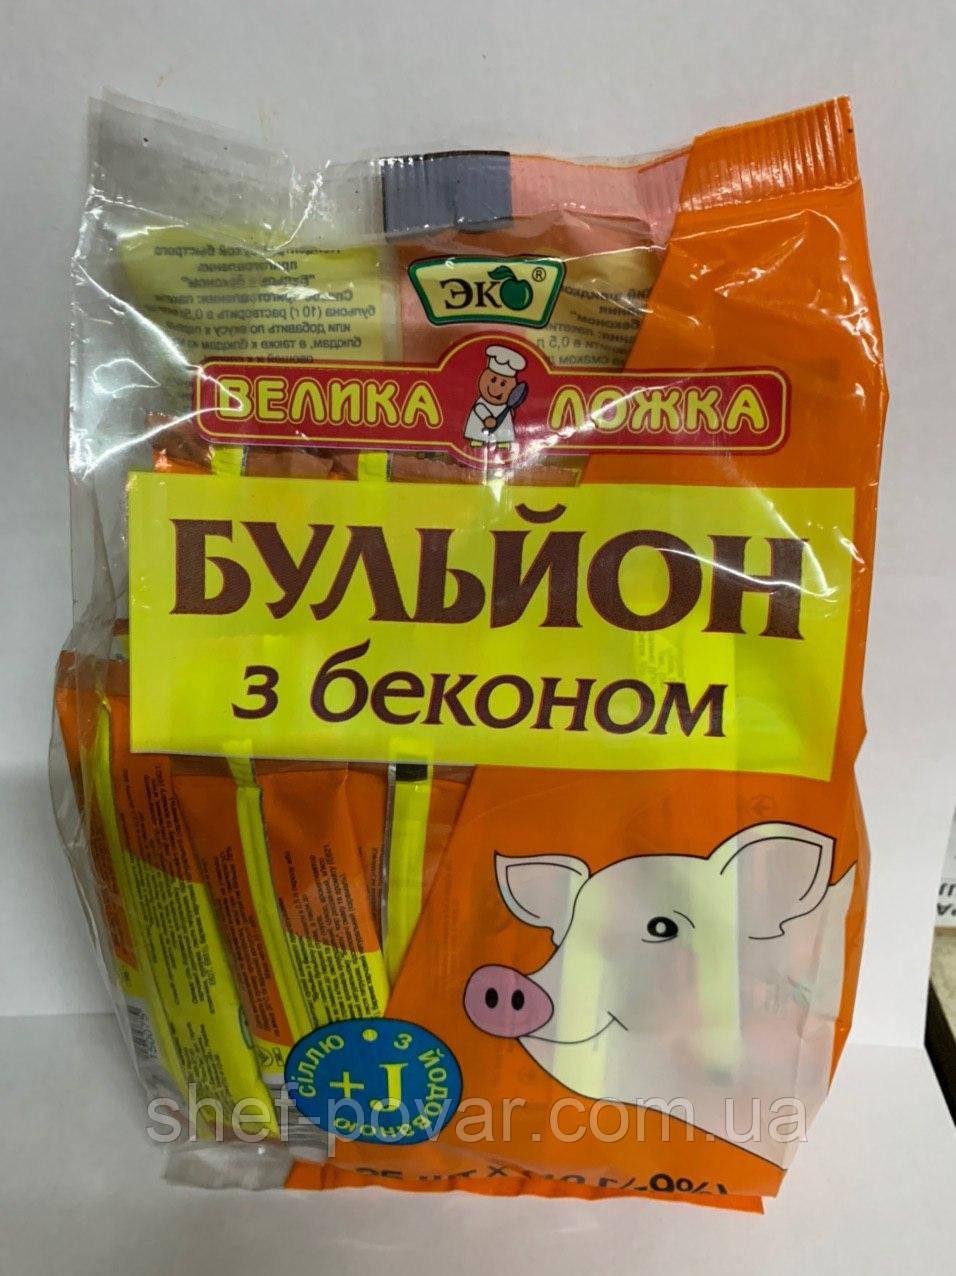 "Бульон с беконом ТМ ""Эко"""